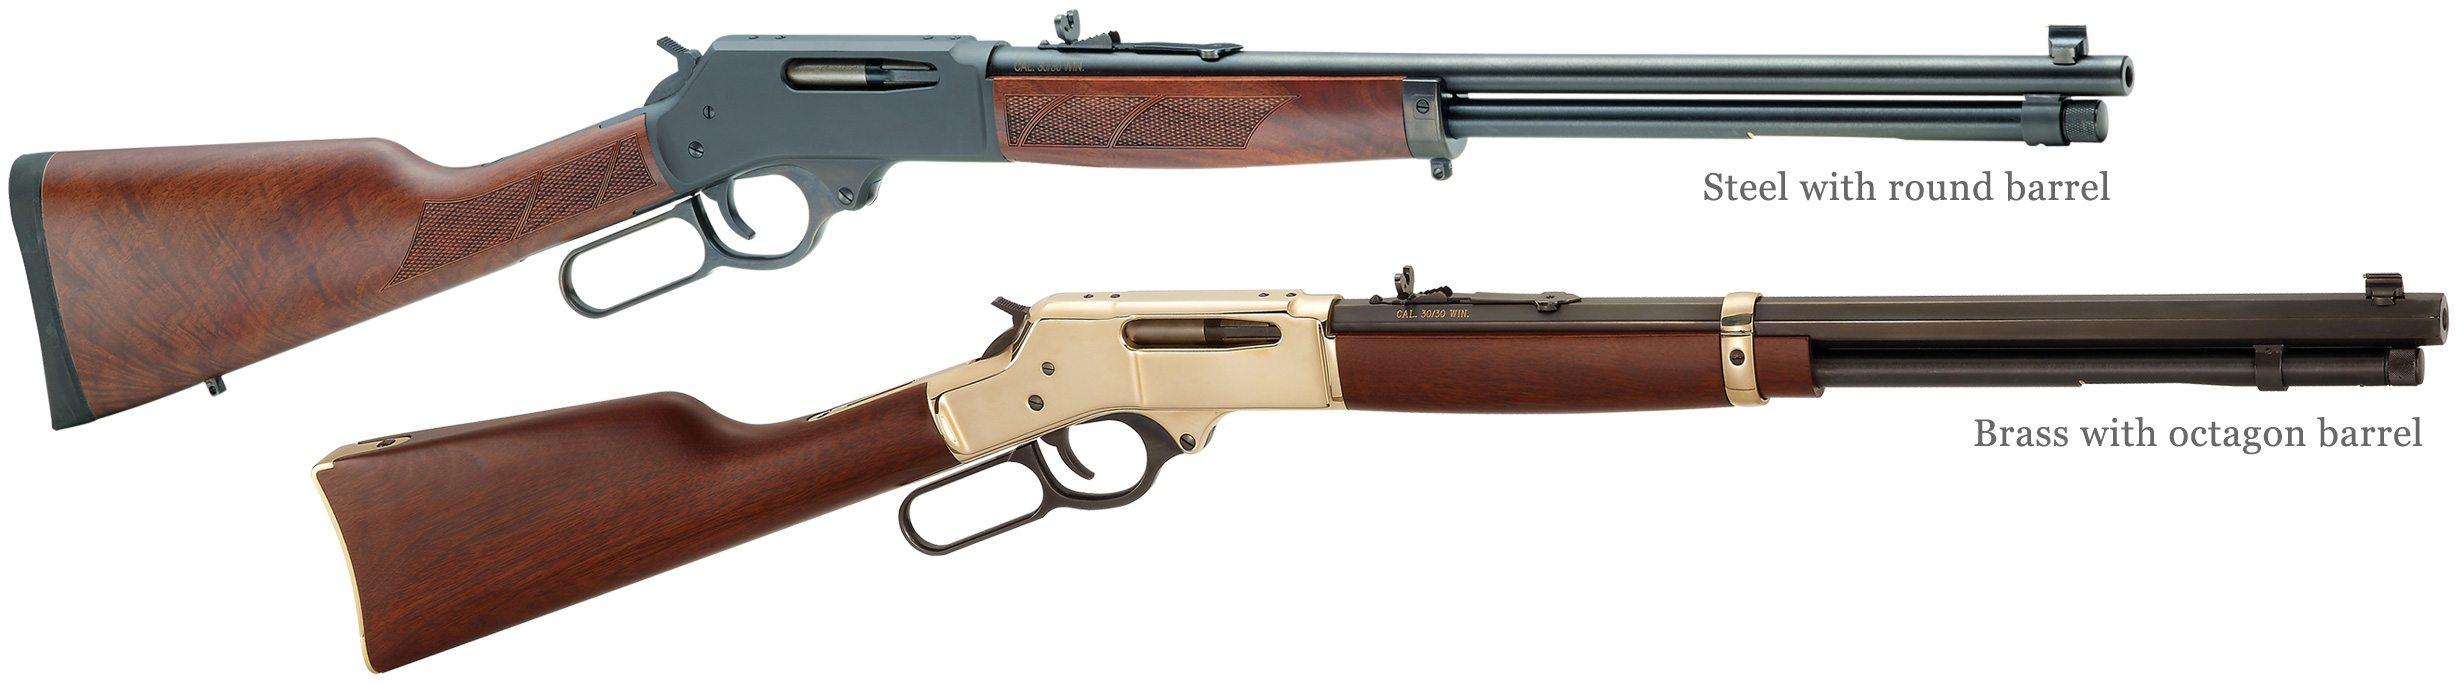 Henry's new side loading gate carbines, yes Henry-30-30-large.jpg